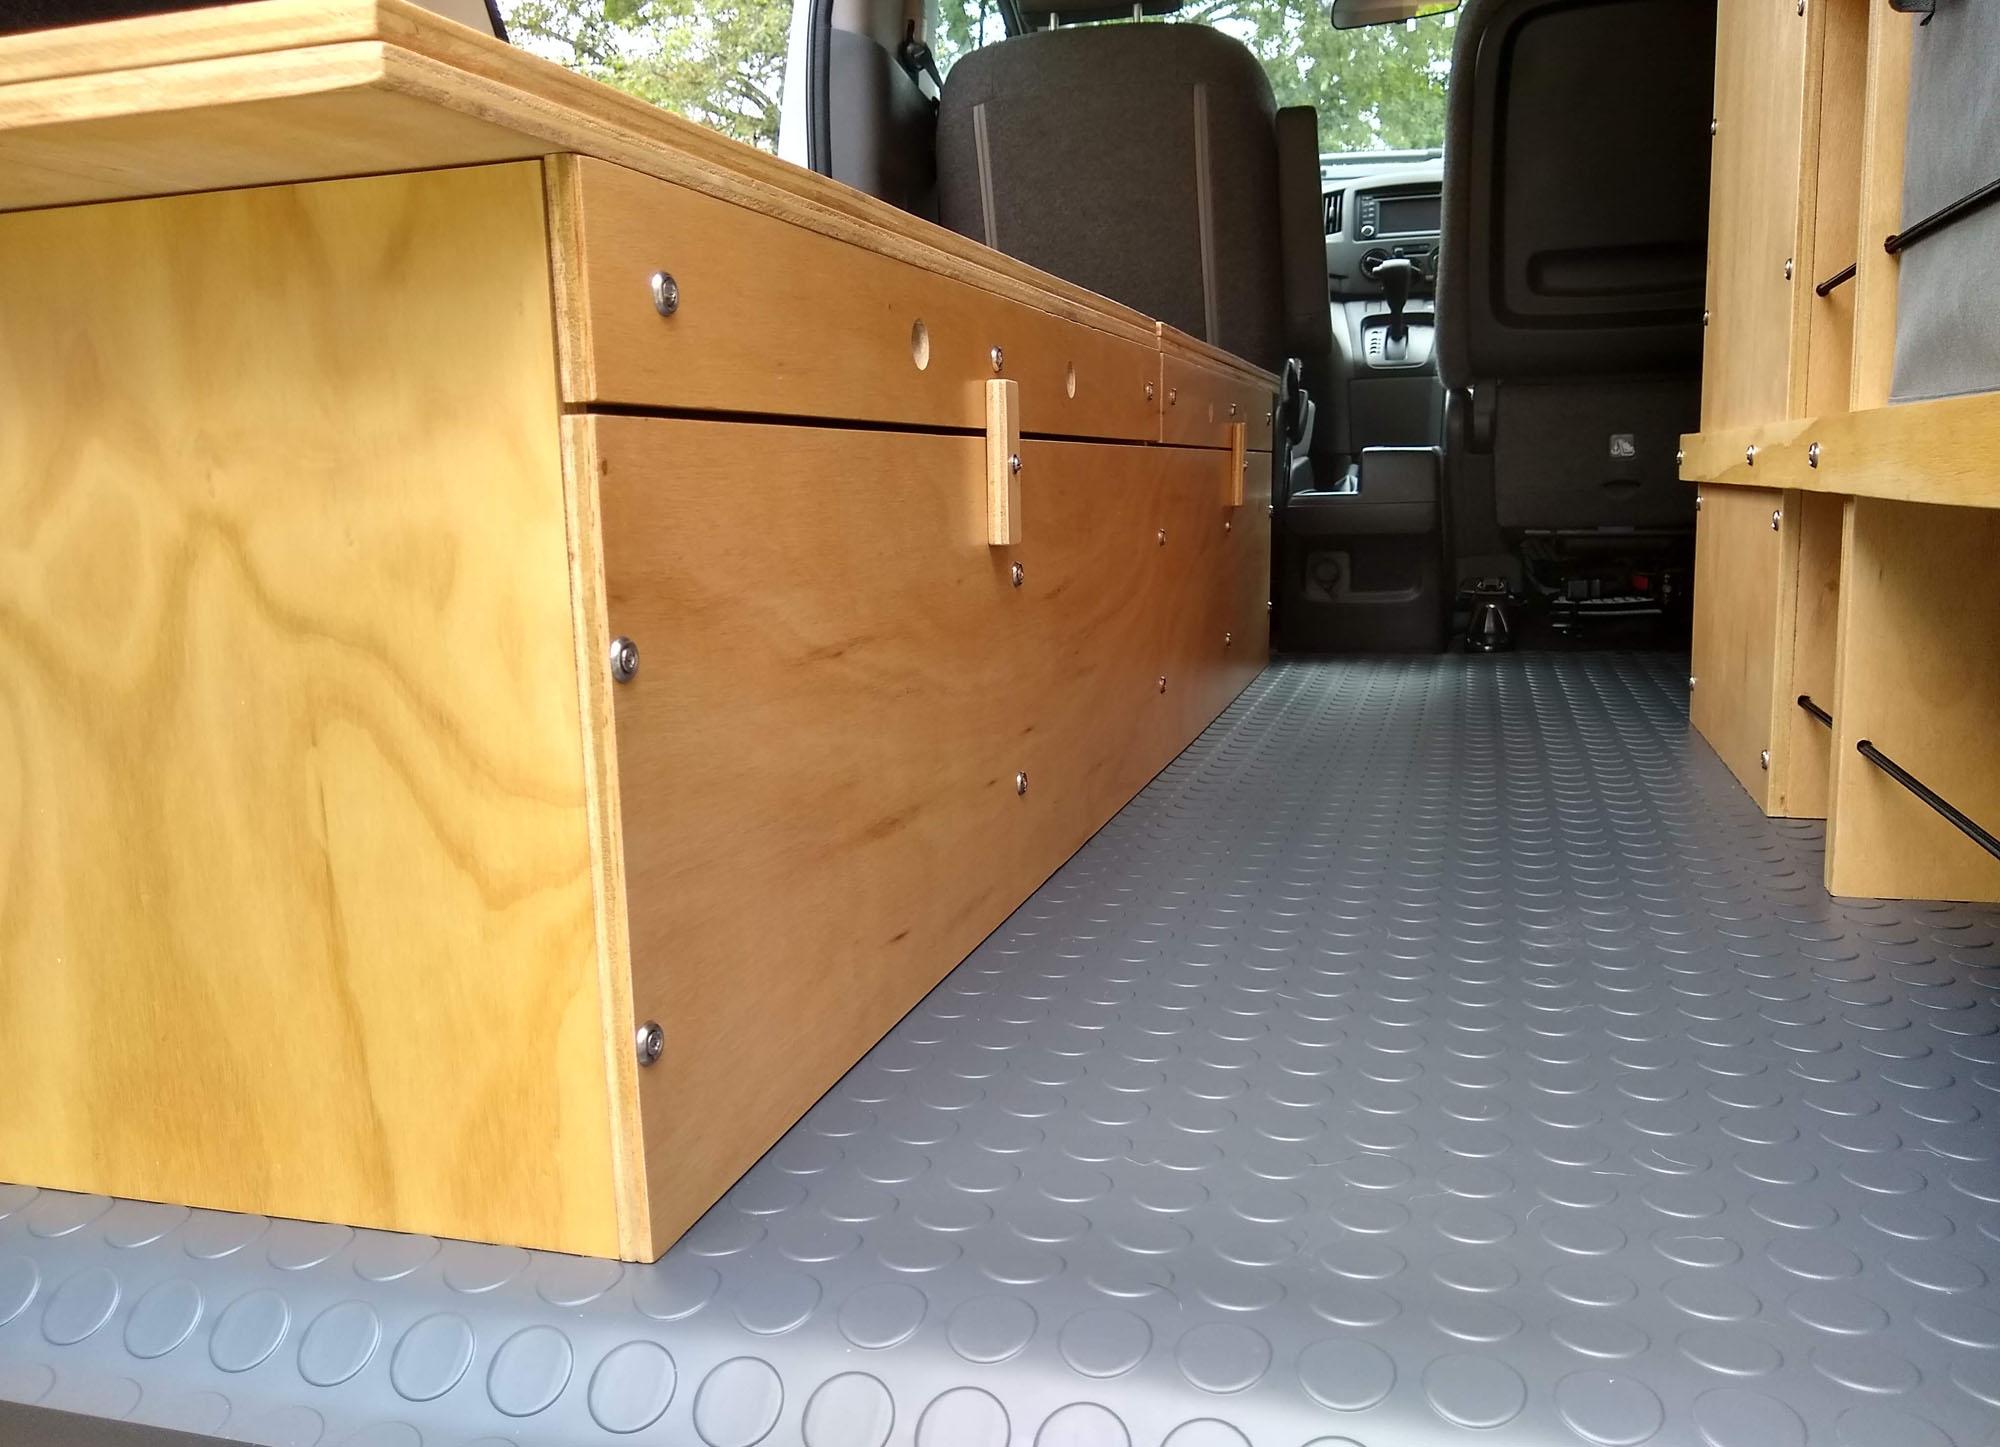 Nissan NV200 Camper Van Conversion - Floor 3